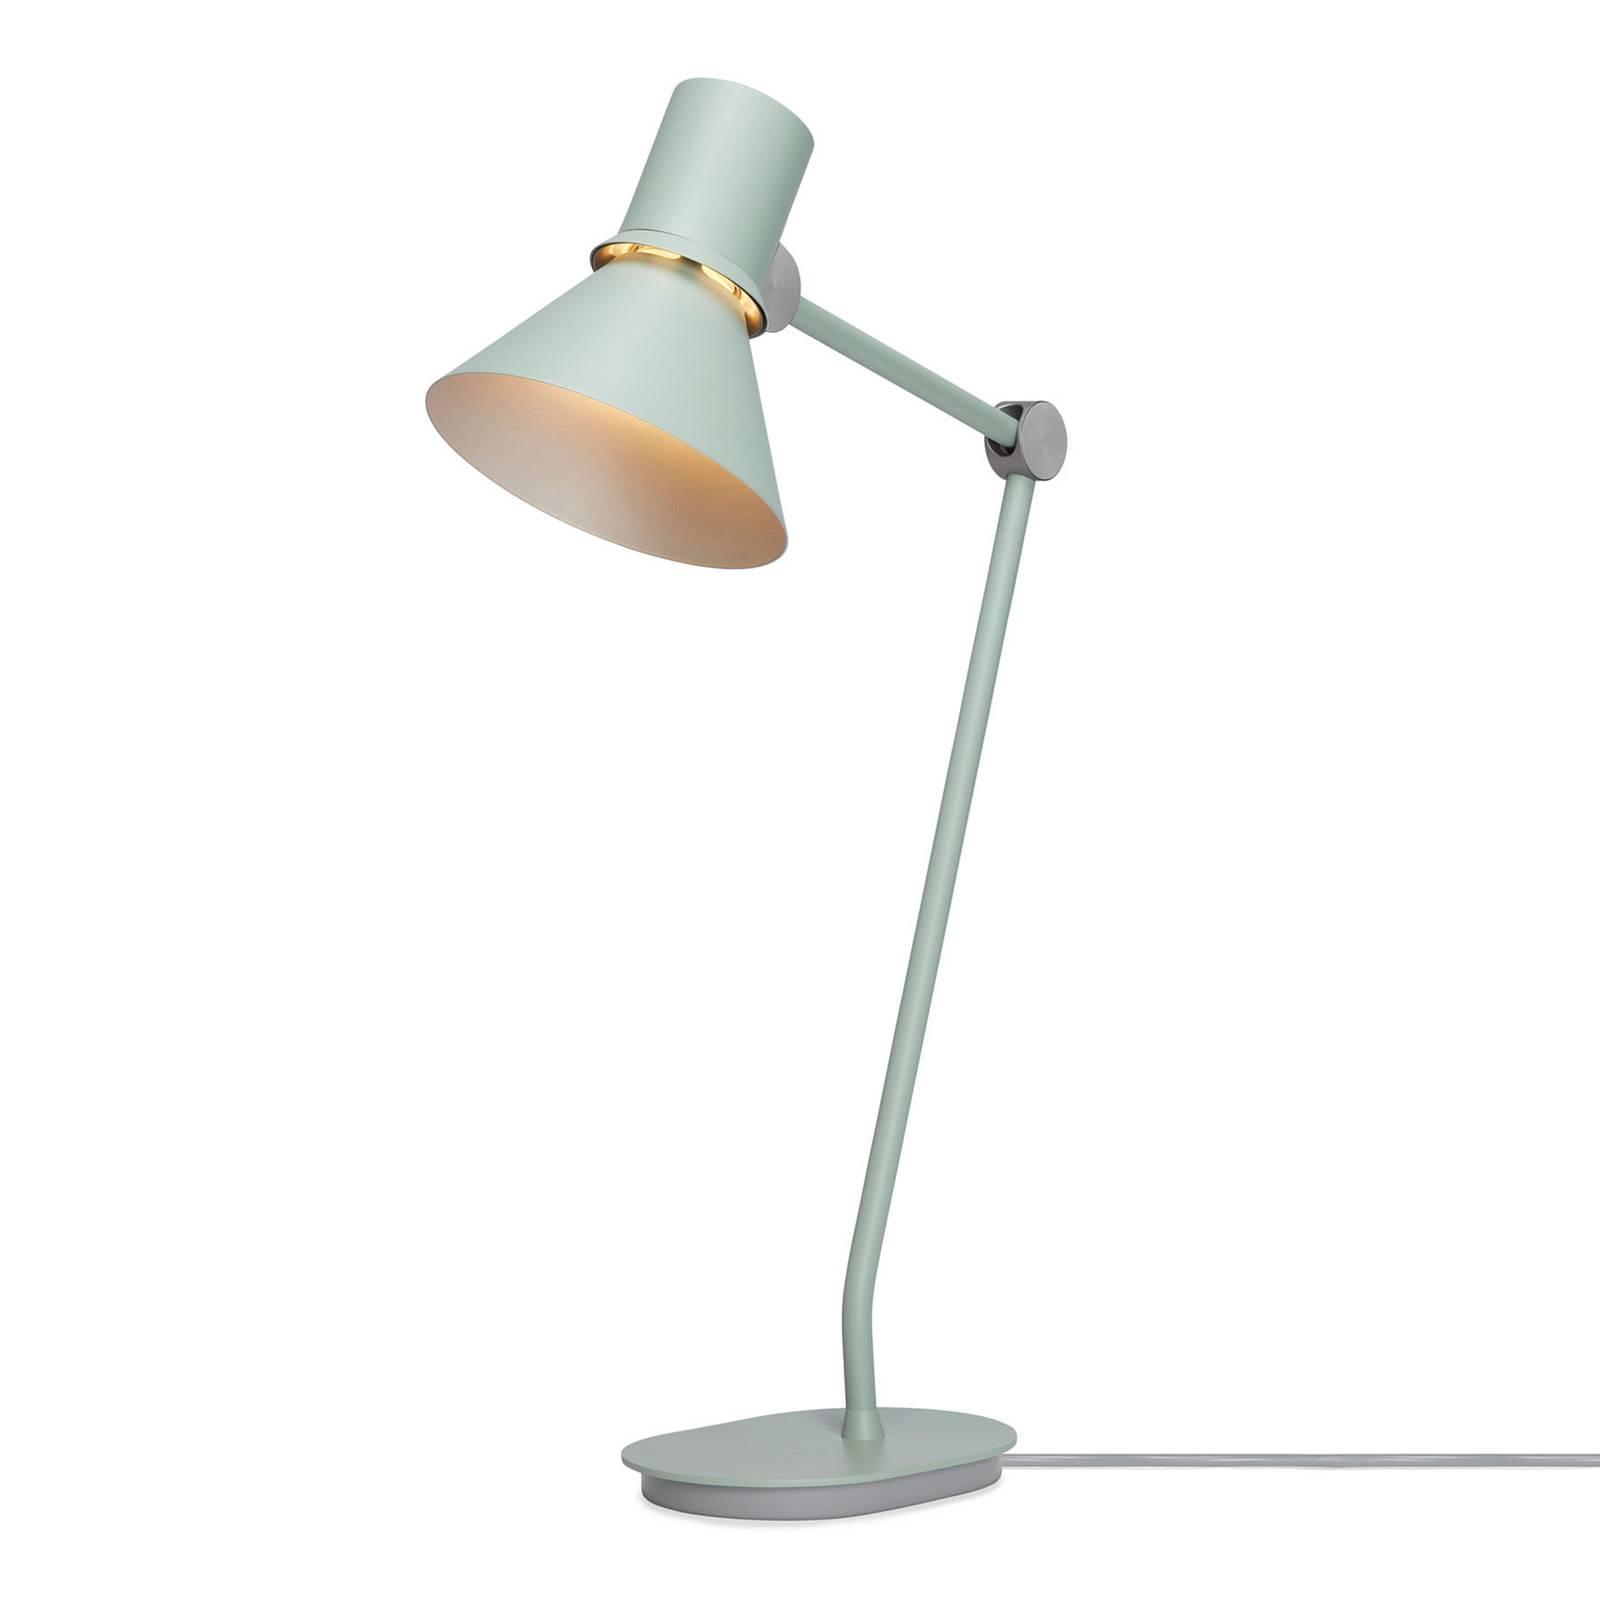 Anglepoise Type 80 lampe à poser, vert pistache